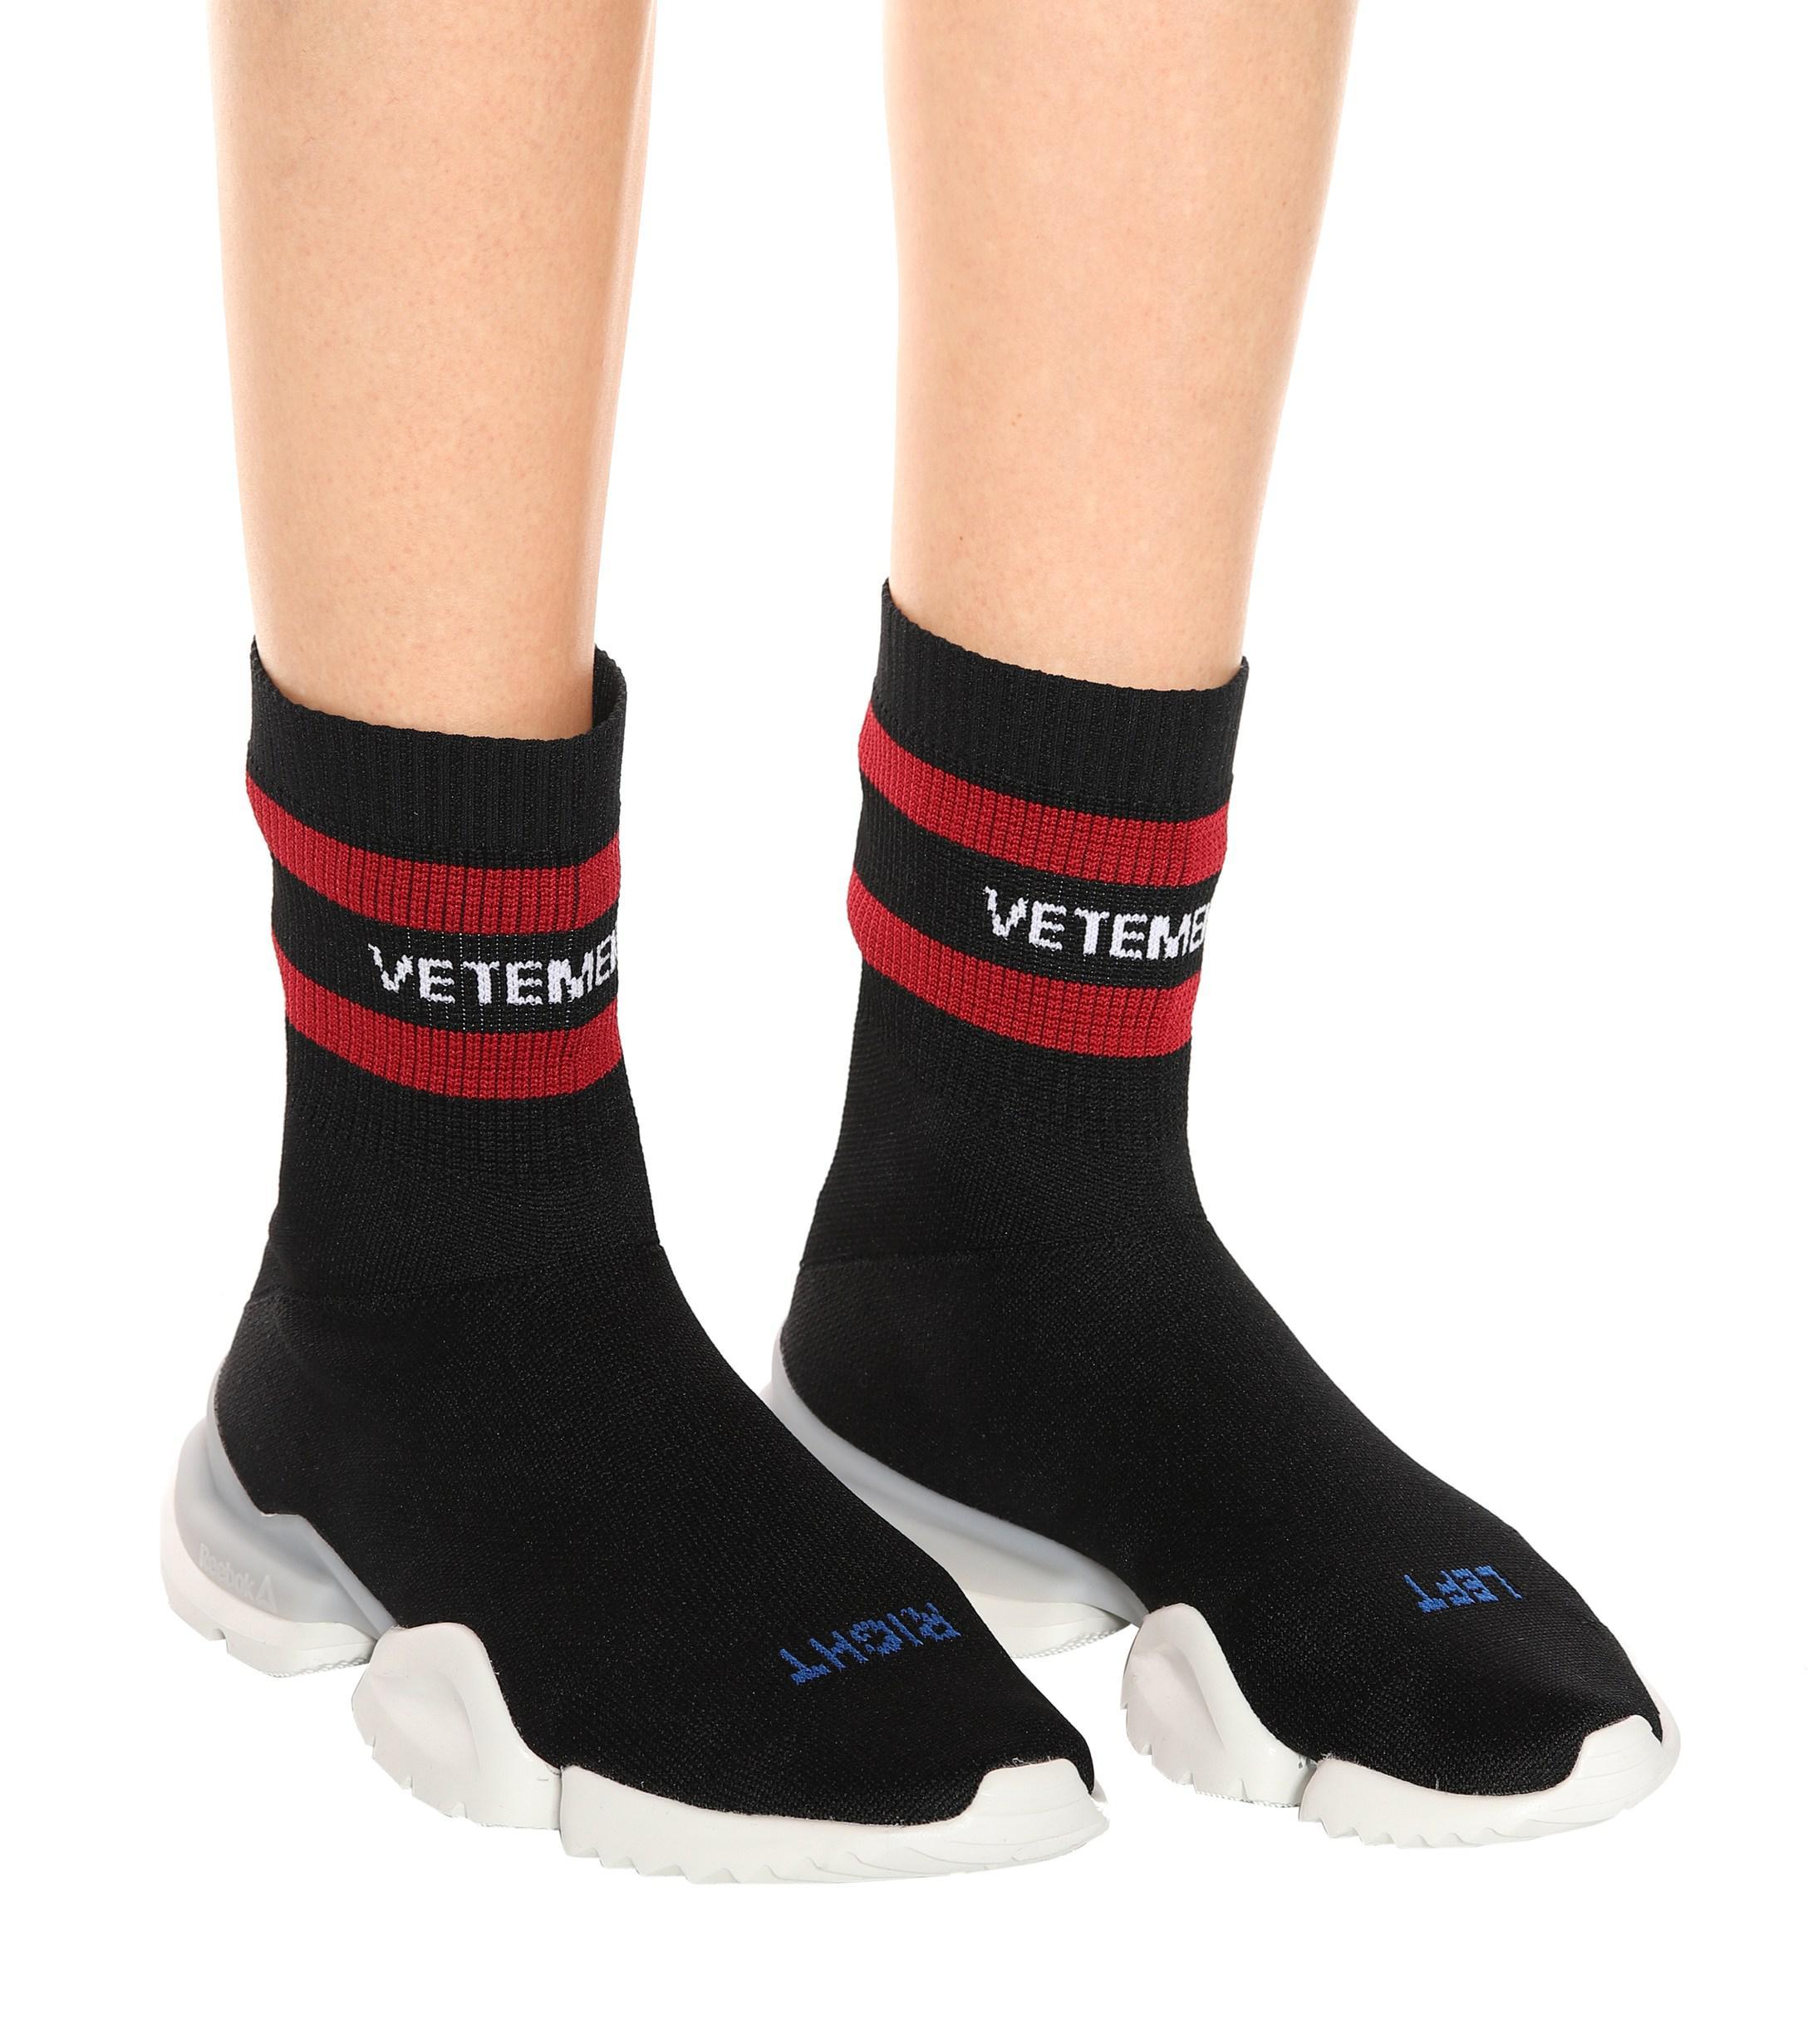 vetements reebok shoes sock